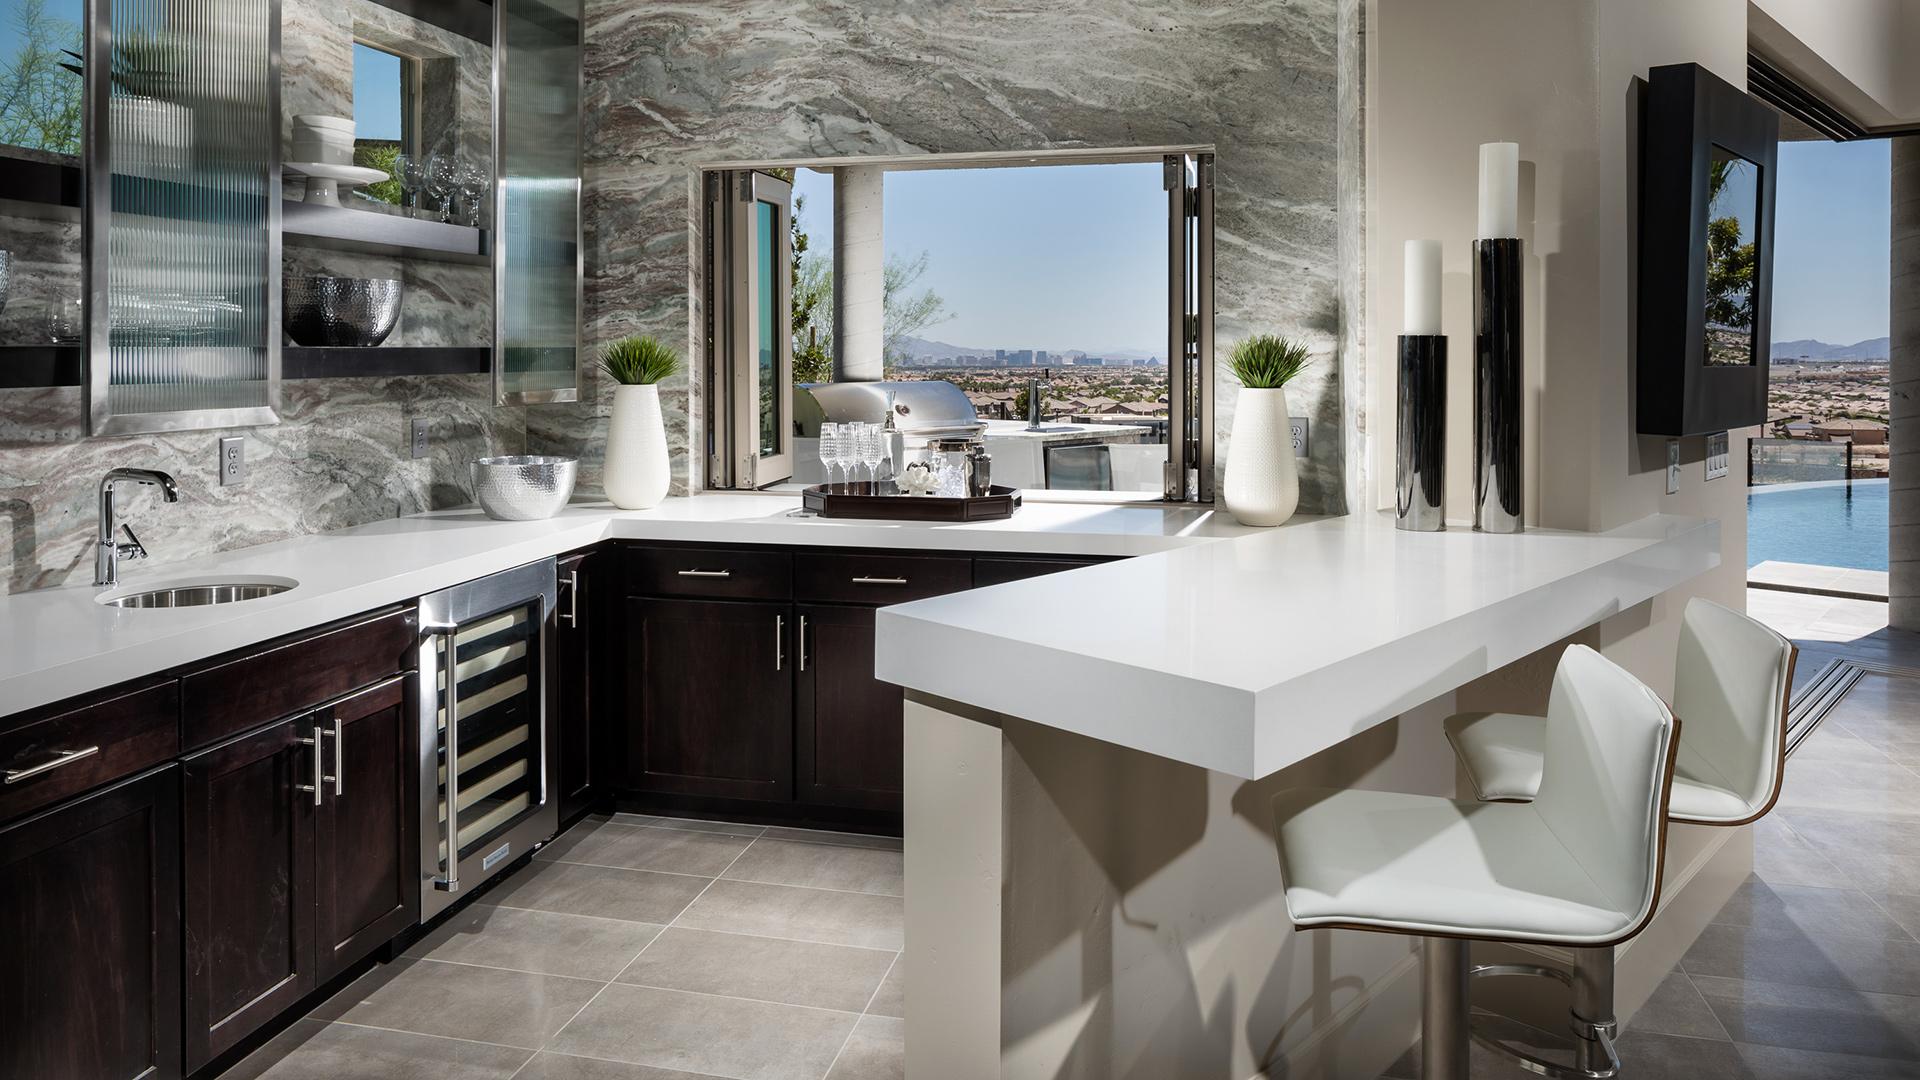 Las Vegas Nv New Homes For Sale Ironwood